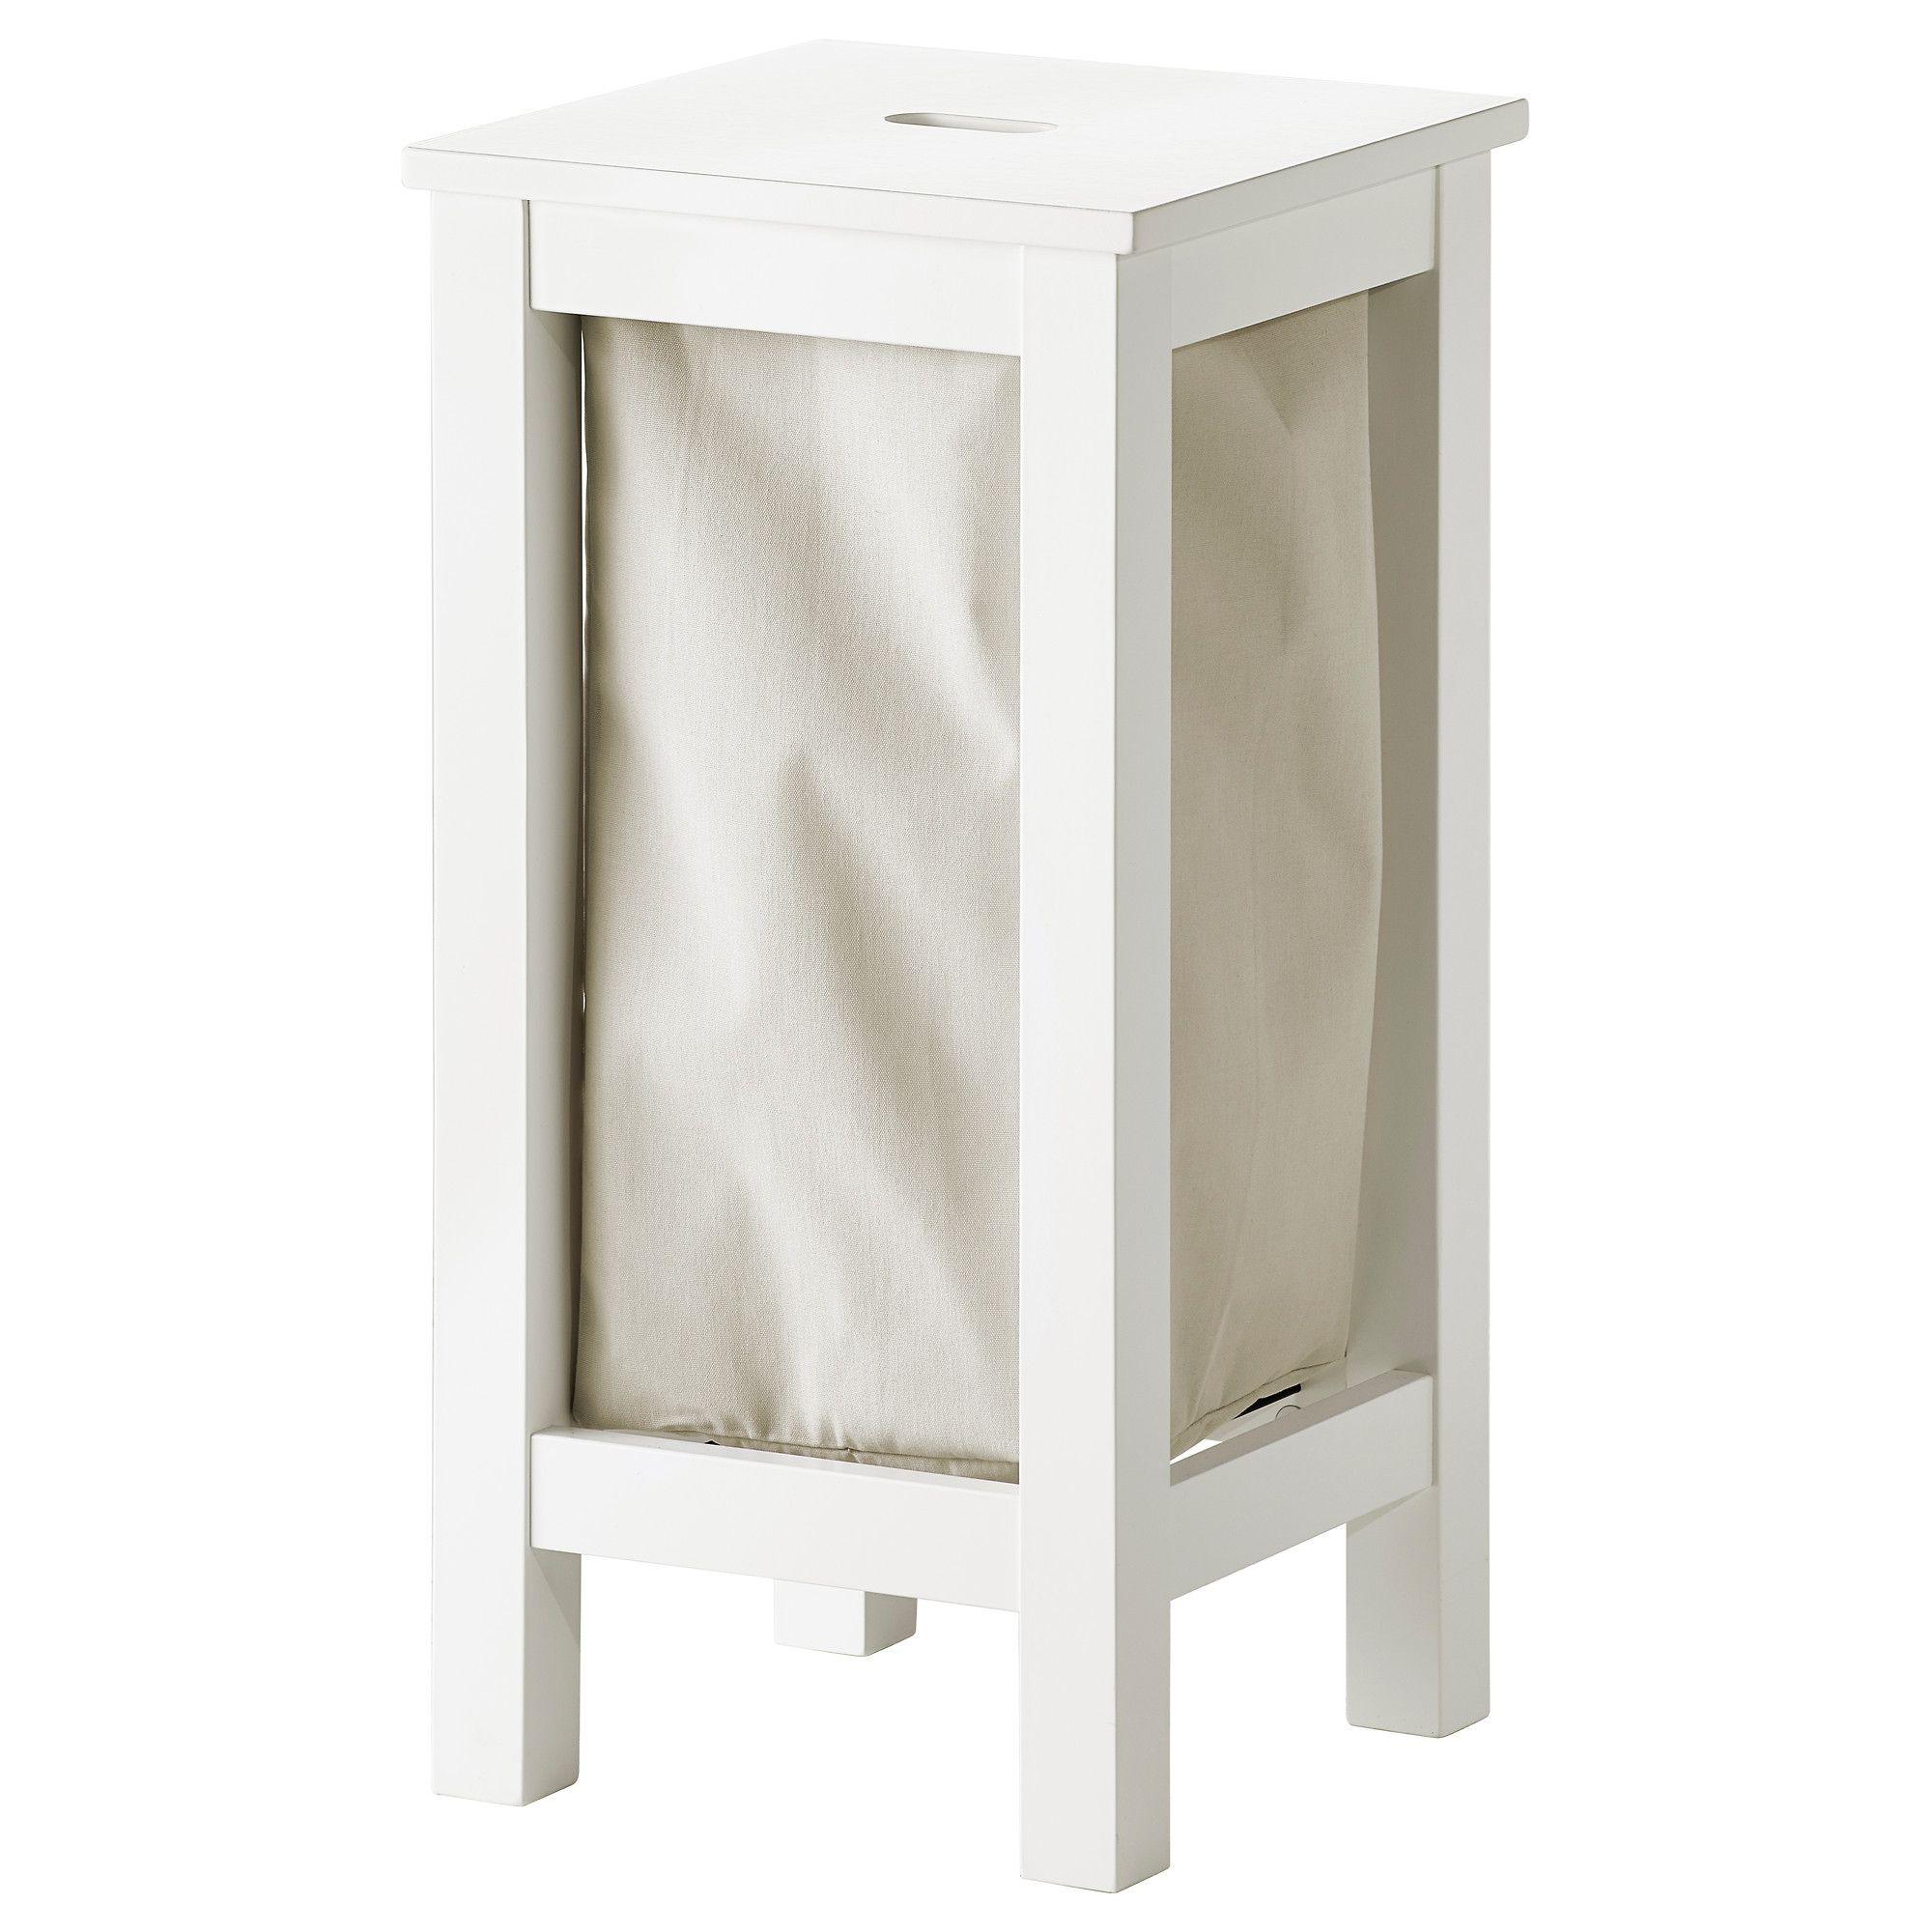 Us Furniture And Home Furnishings Lavandería Ikea Baño